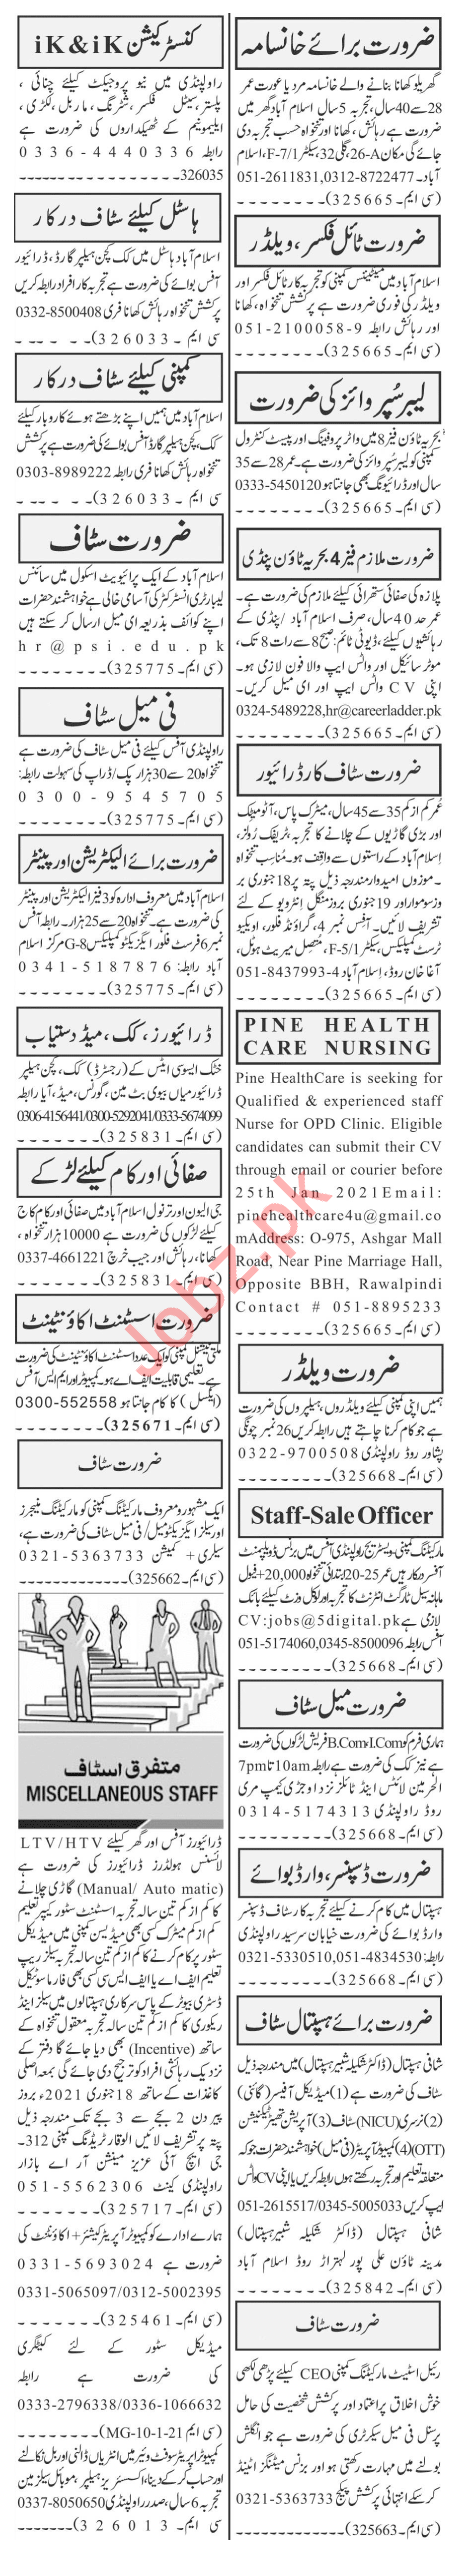 Daily Jang Sunday 17 January Management Jobs 2021 Islamabad